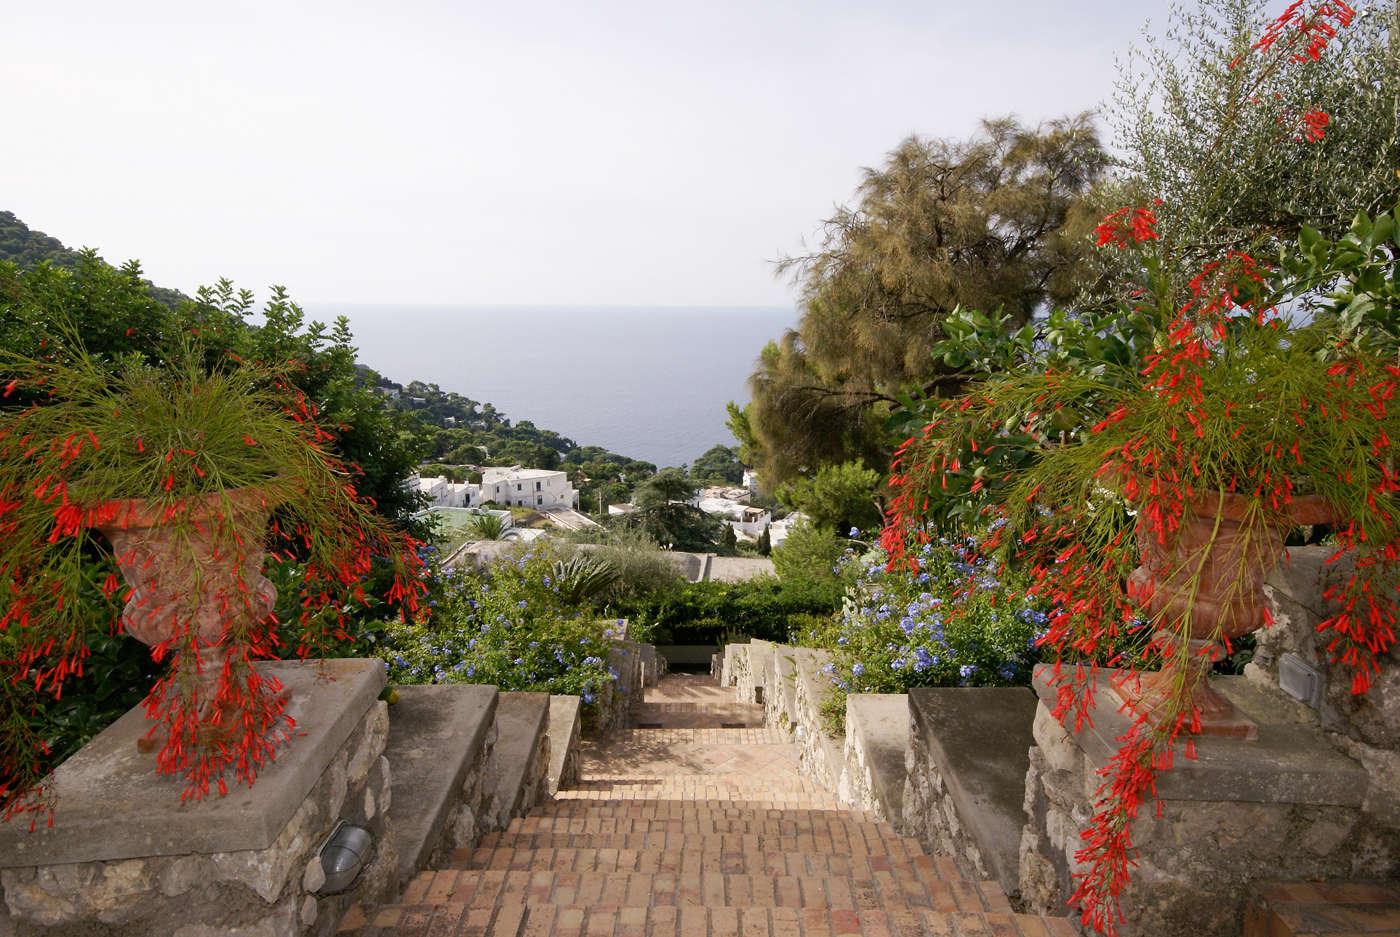 Luxury vacation rentals europe - Italy - Campania ih - Capri island - Il Fortino - Image 1/20